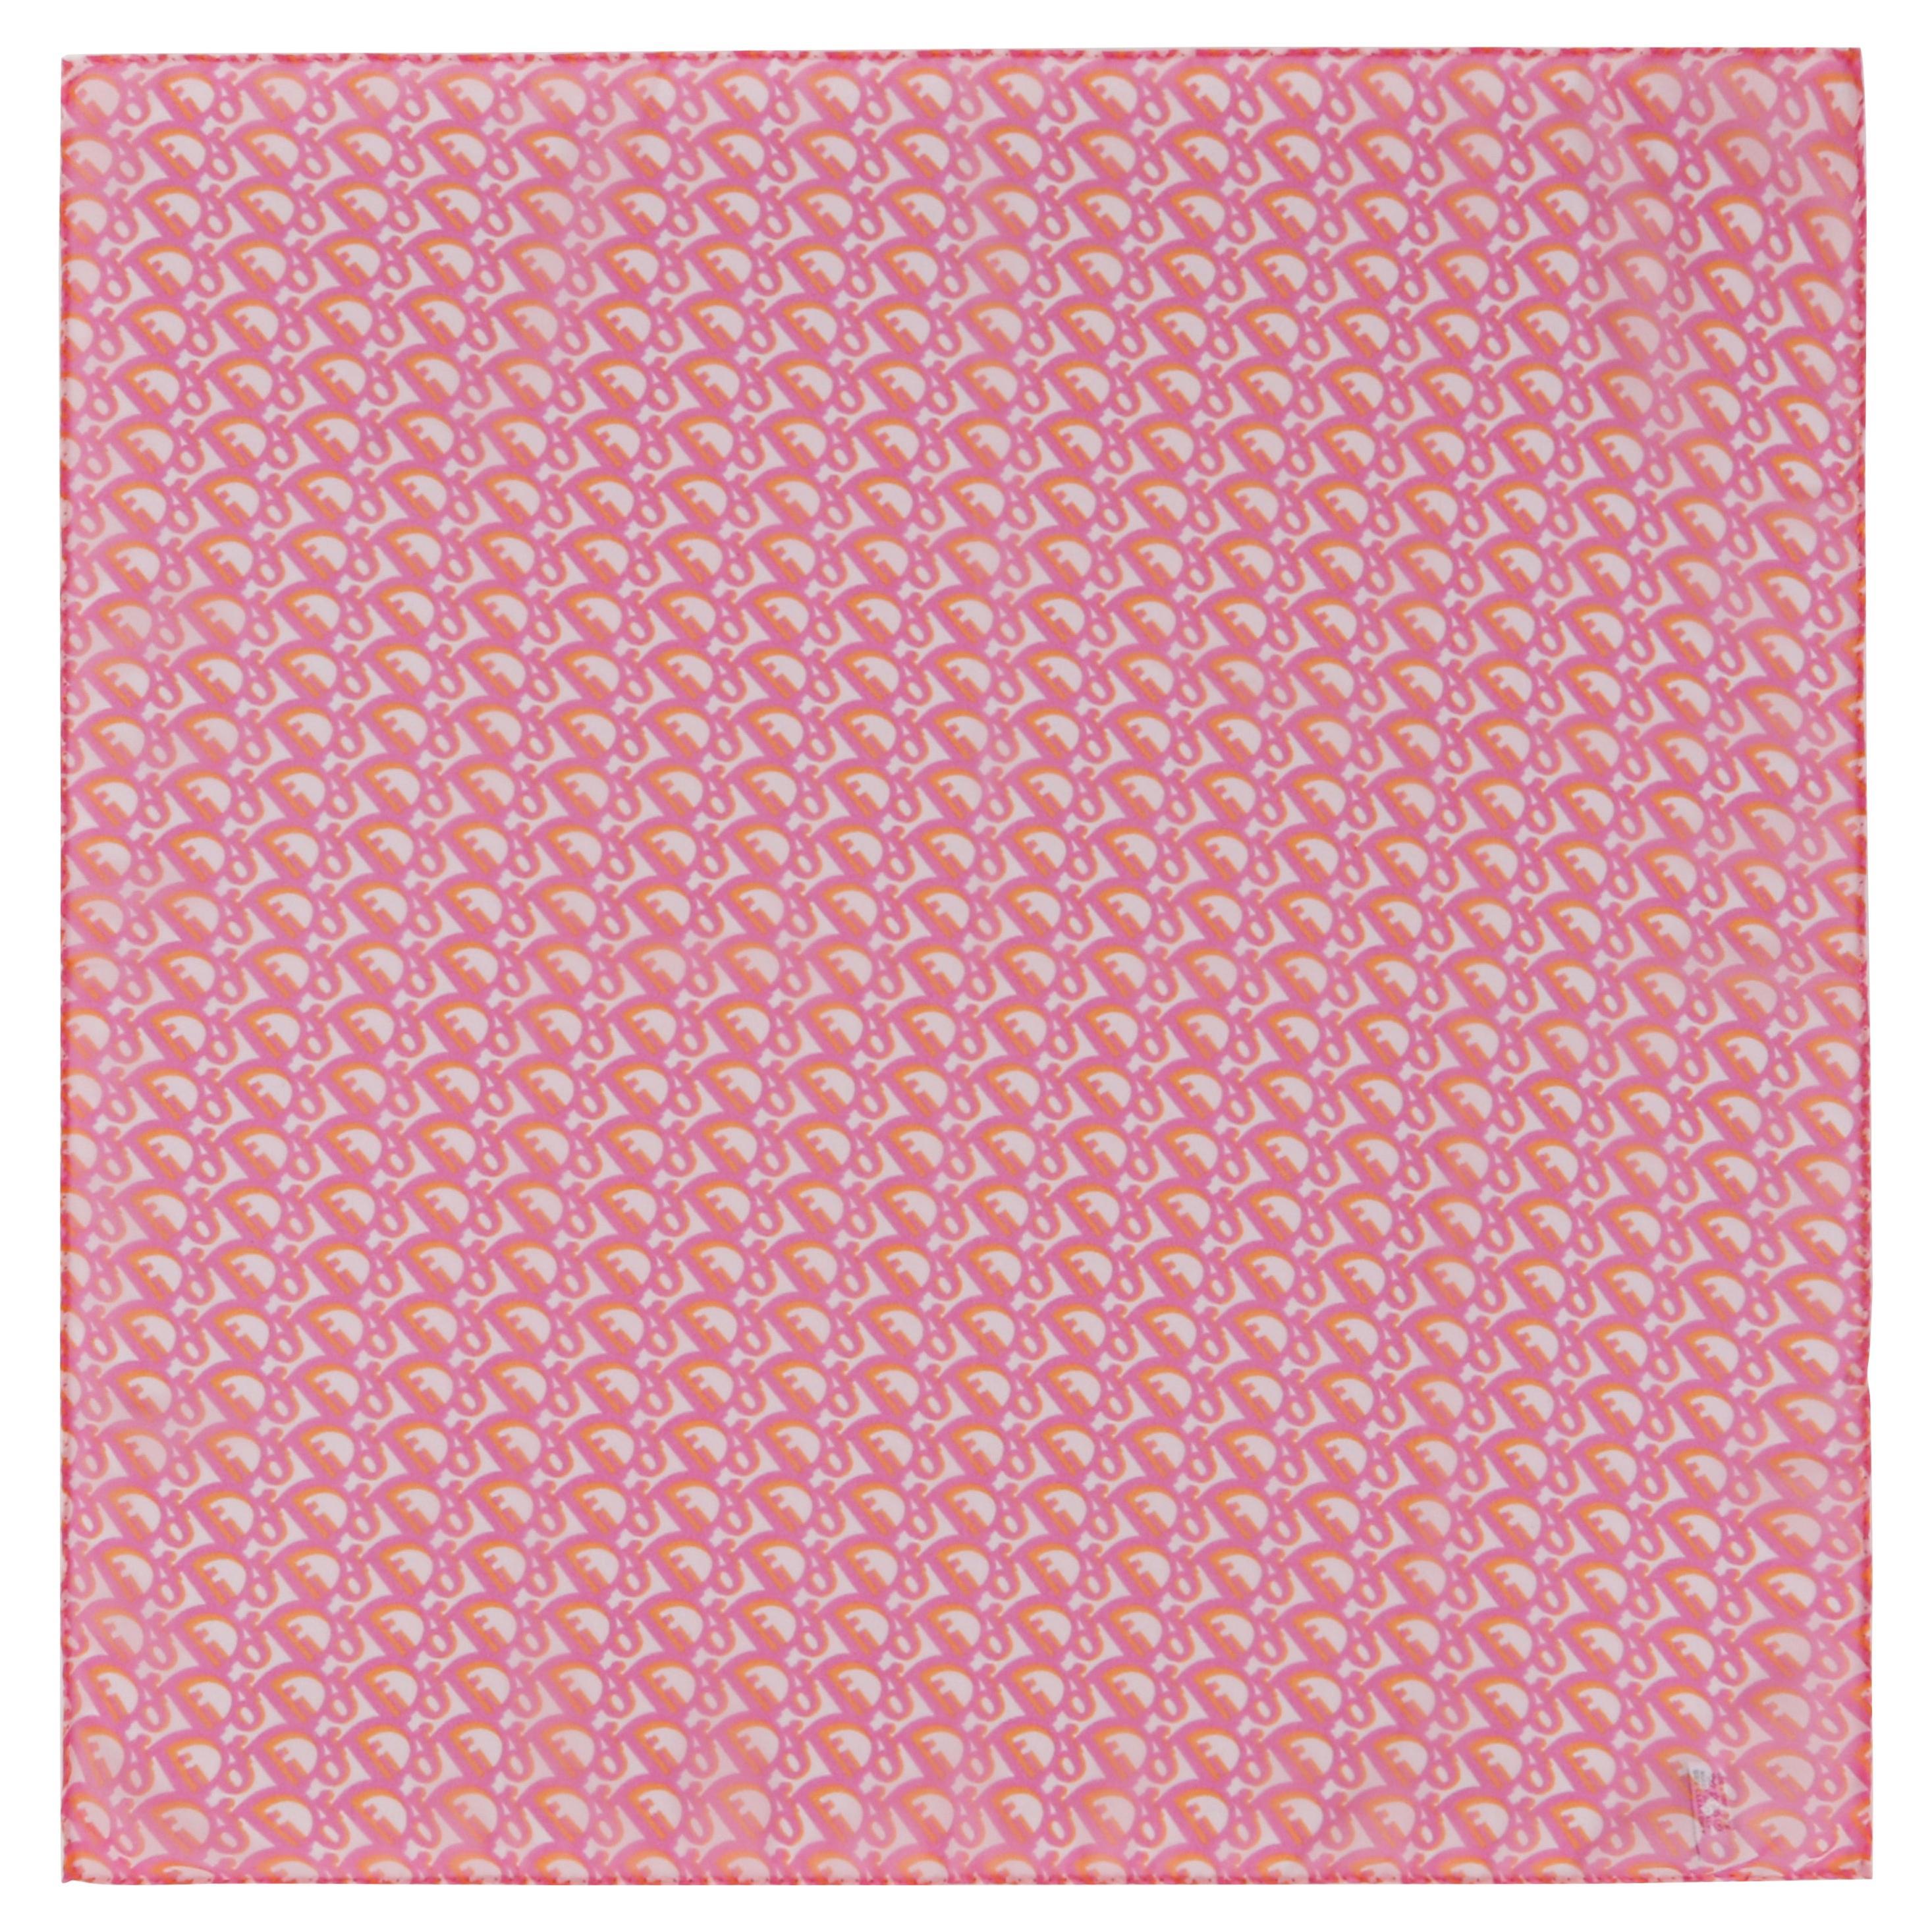 "CHRISTIAN DIOR ""Trotter"" Pink & Orange Diorissimo Silk Chiffon Scarf w/ Envelope"